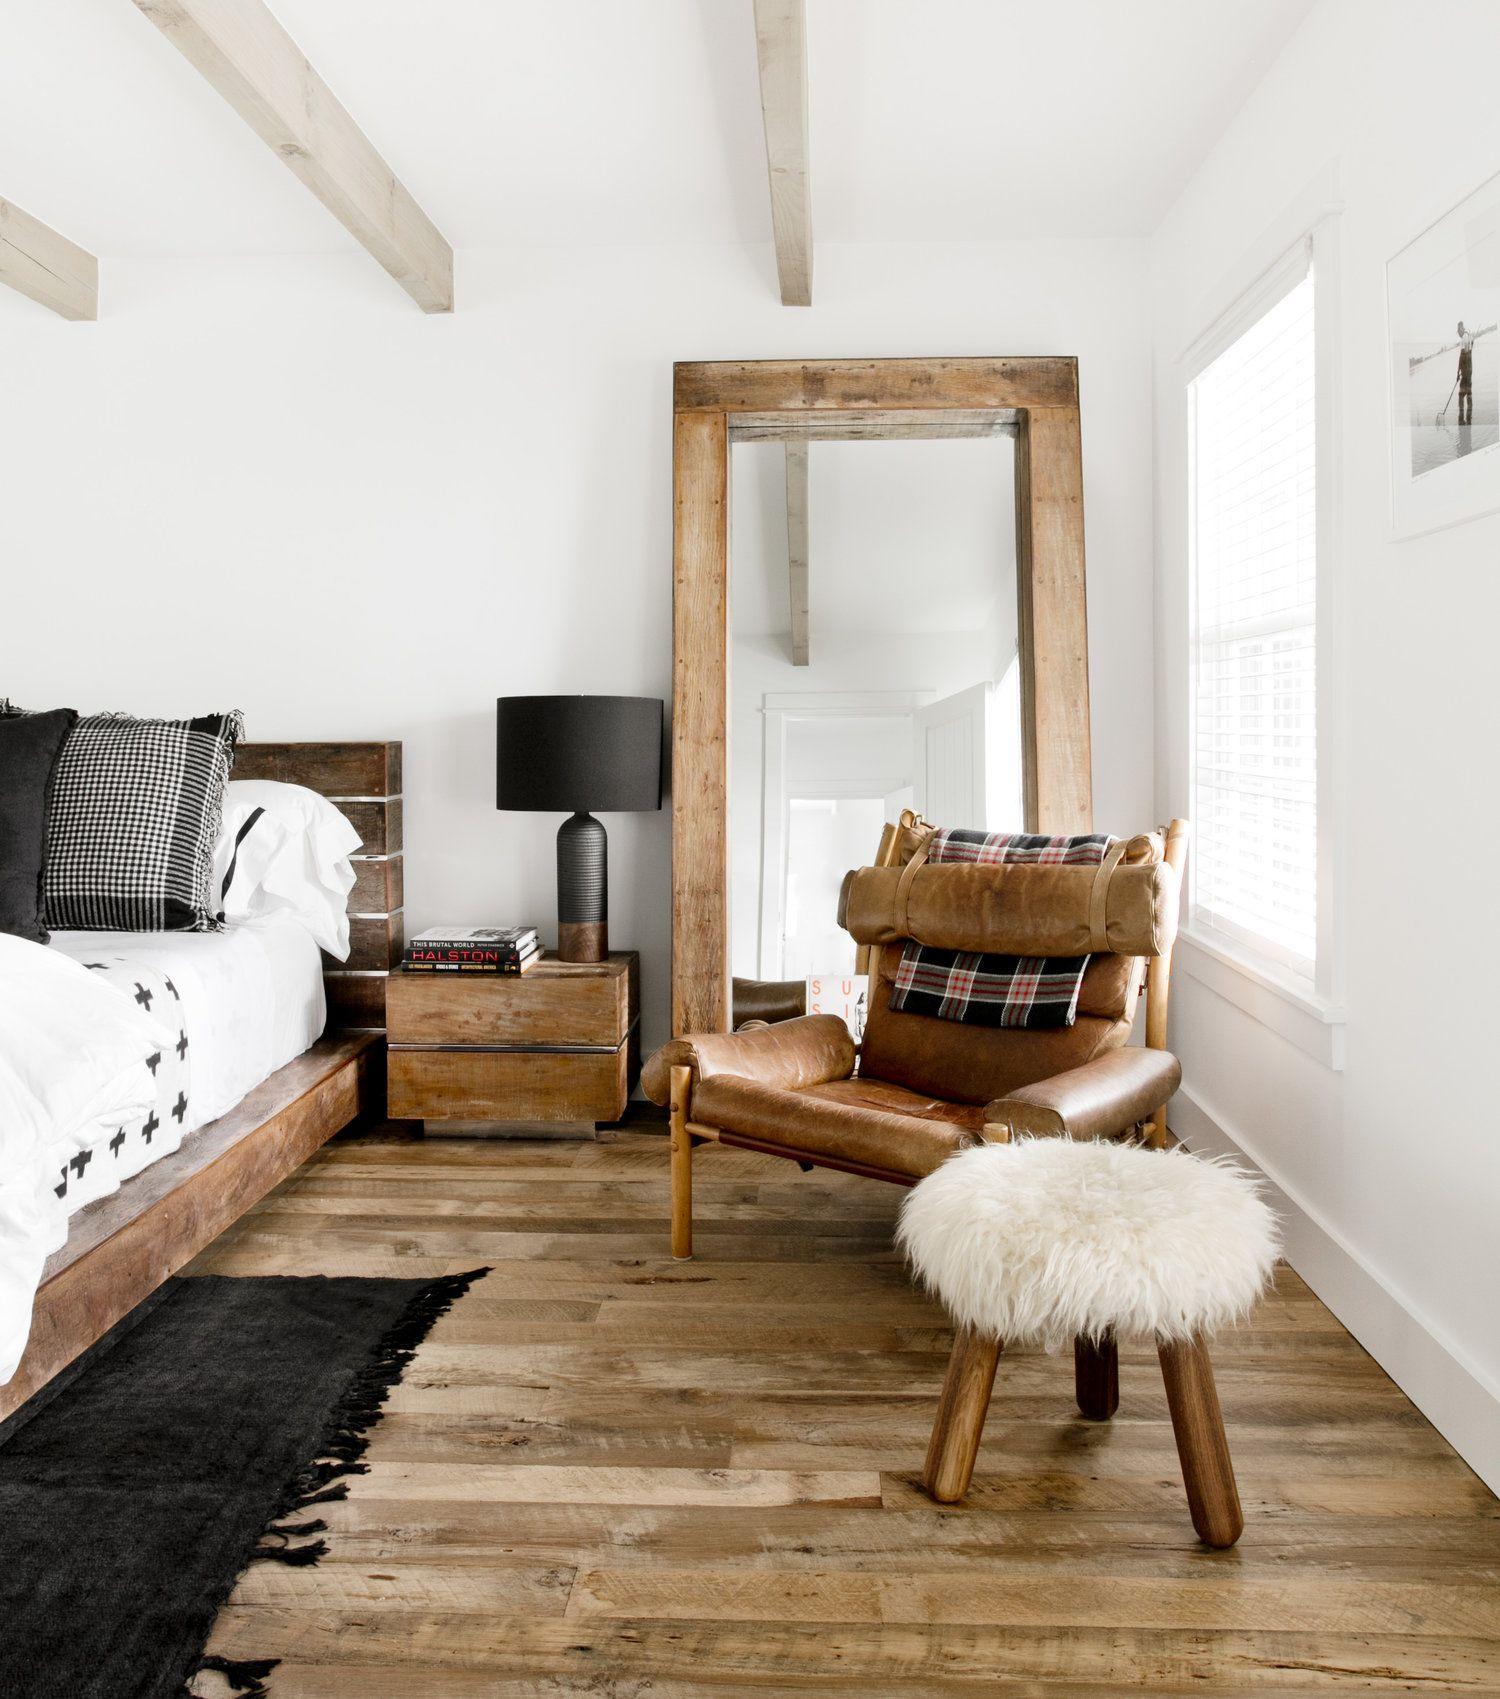 Master bedroom new design  Timothy Goldbold  Bedroom  Pinterest  Bedrooms Interiors and Beams